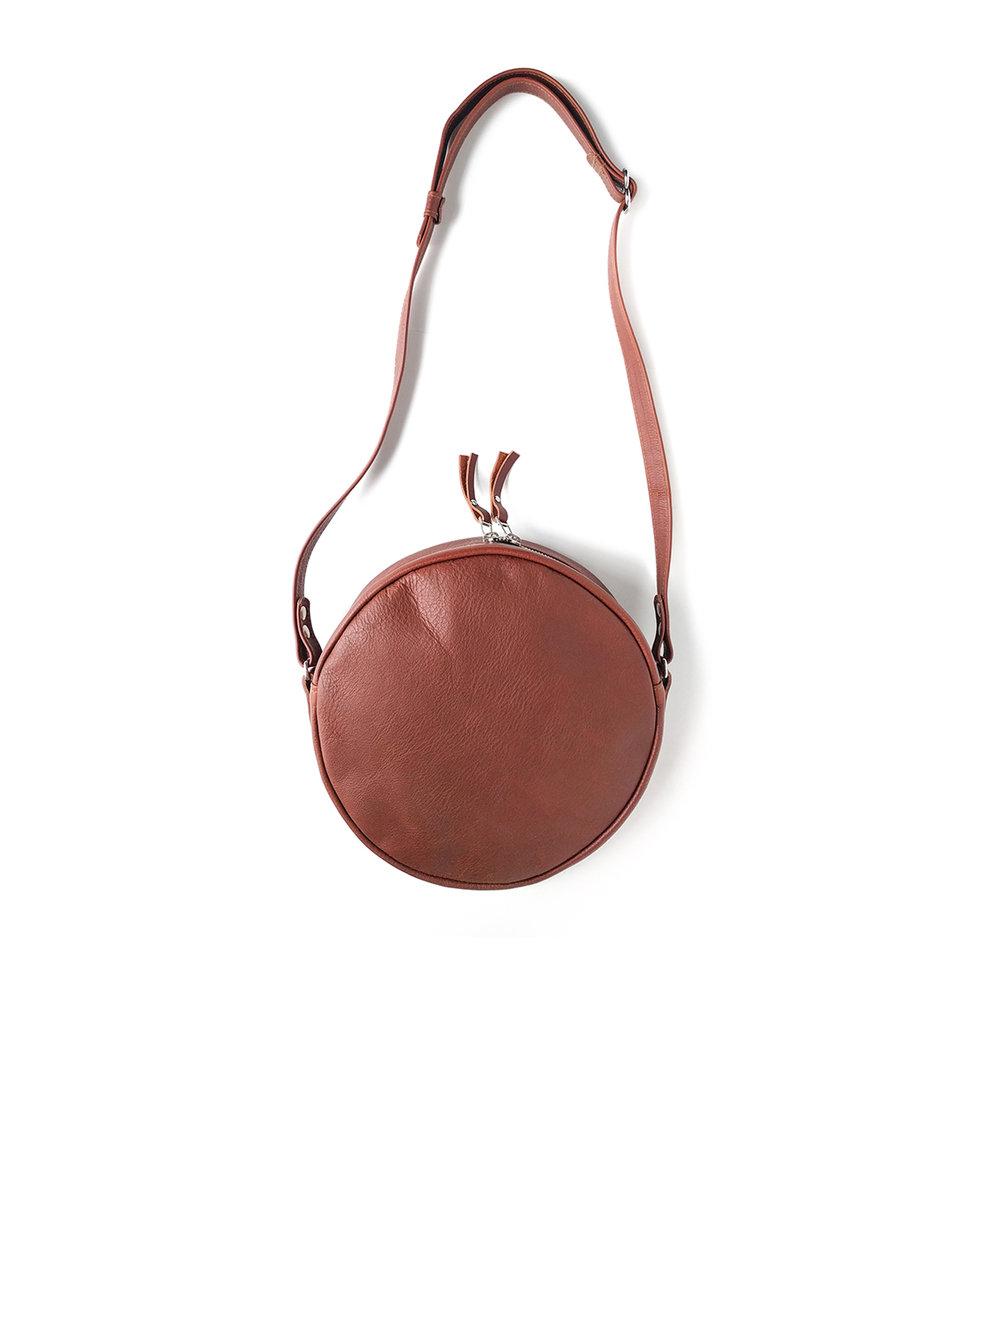 Orbit handbag - more colors available140.00$